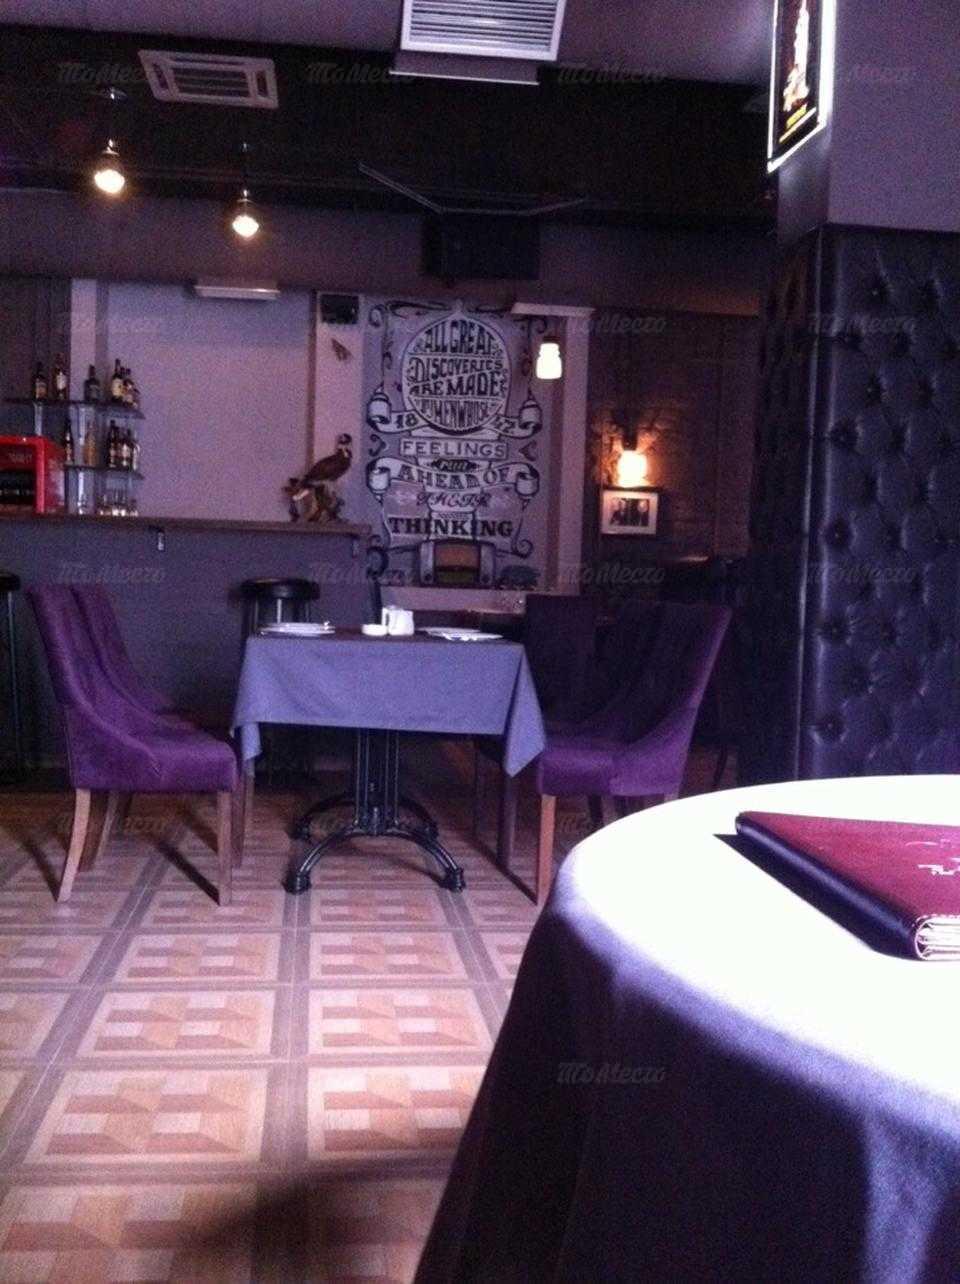 Меню бара, ресторана Edison (Эдисон) на улице Максима Горького